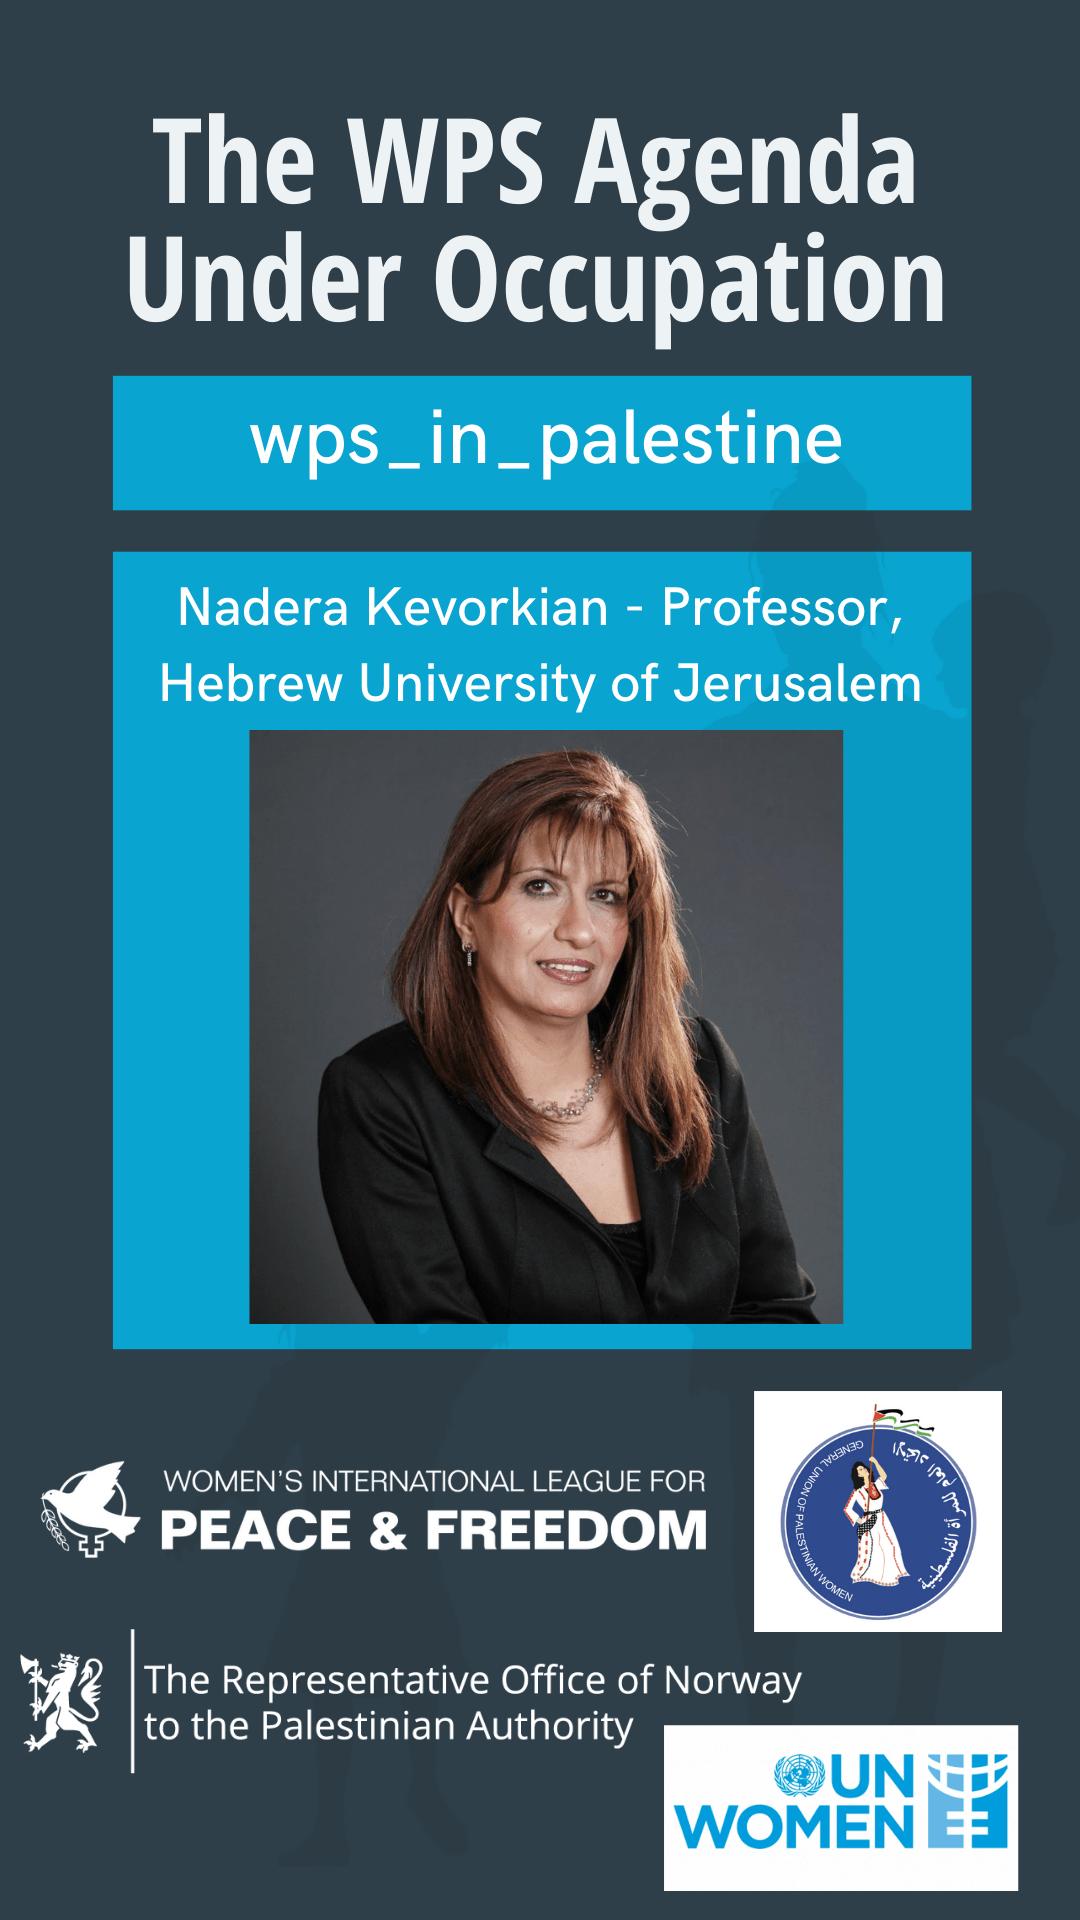 Nadera Kevorkian, professor at the Hebrew University of Jerusalem